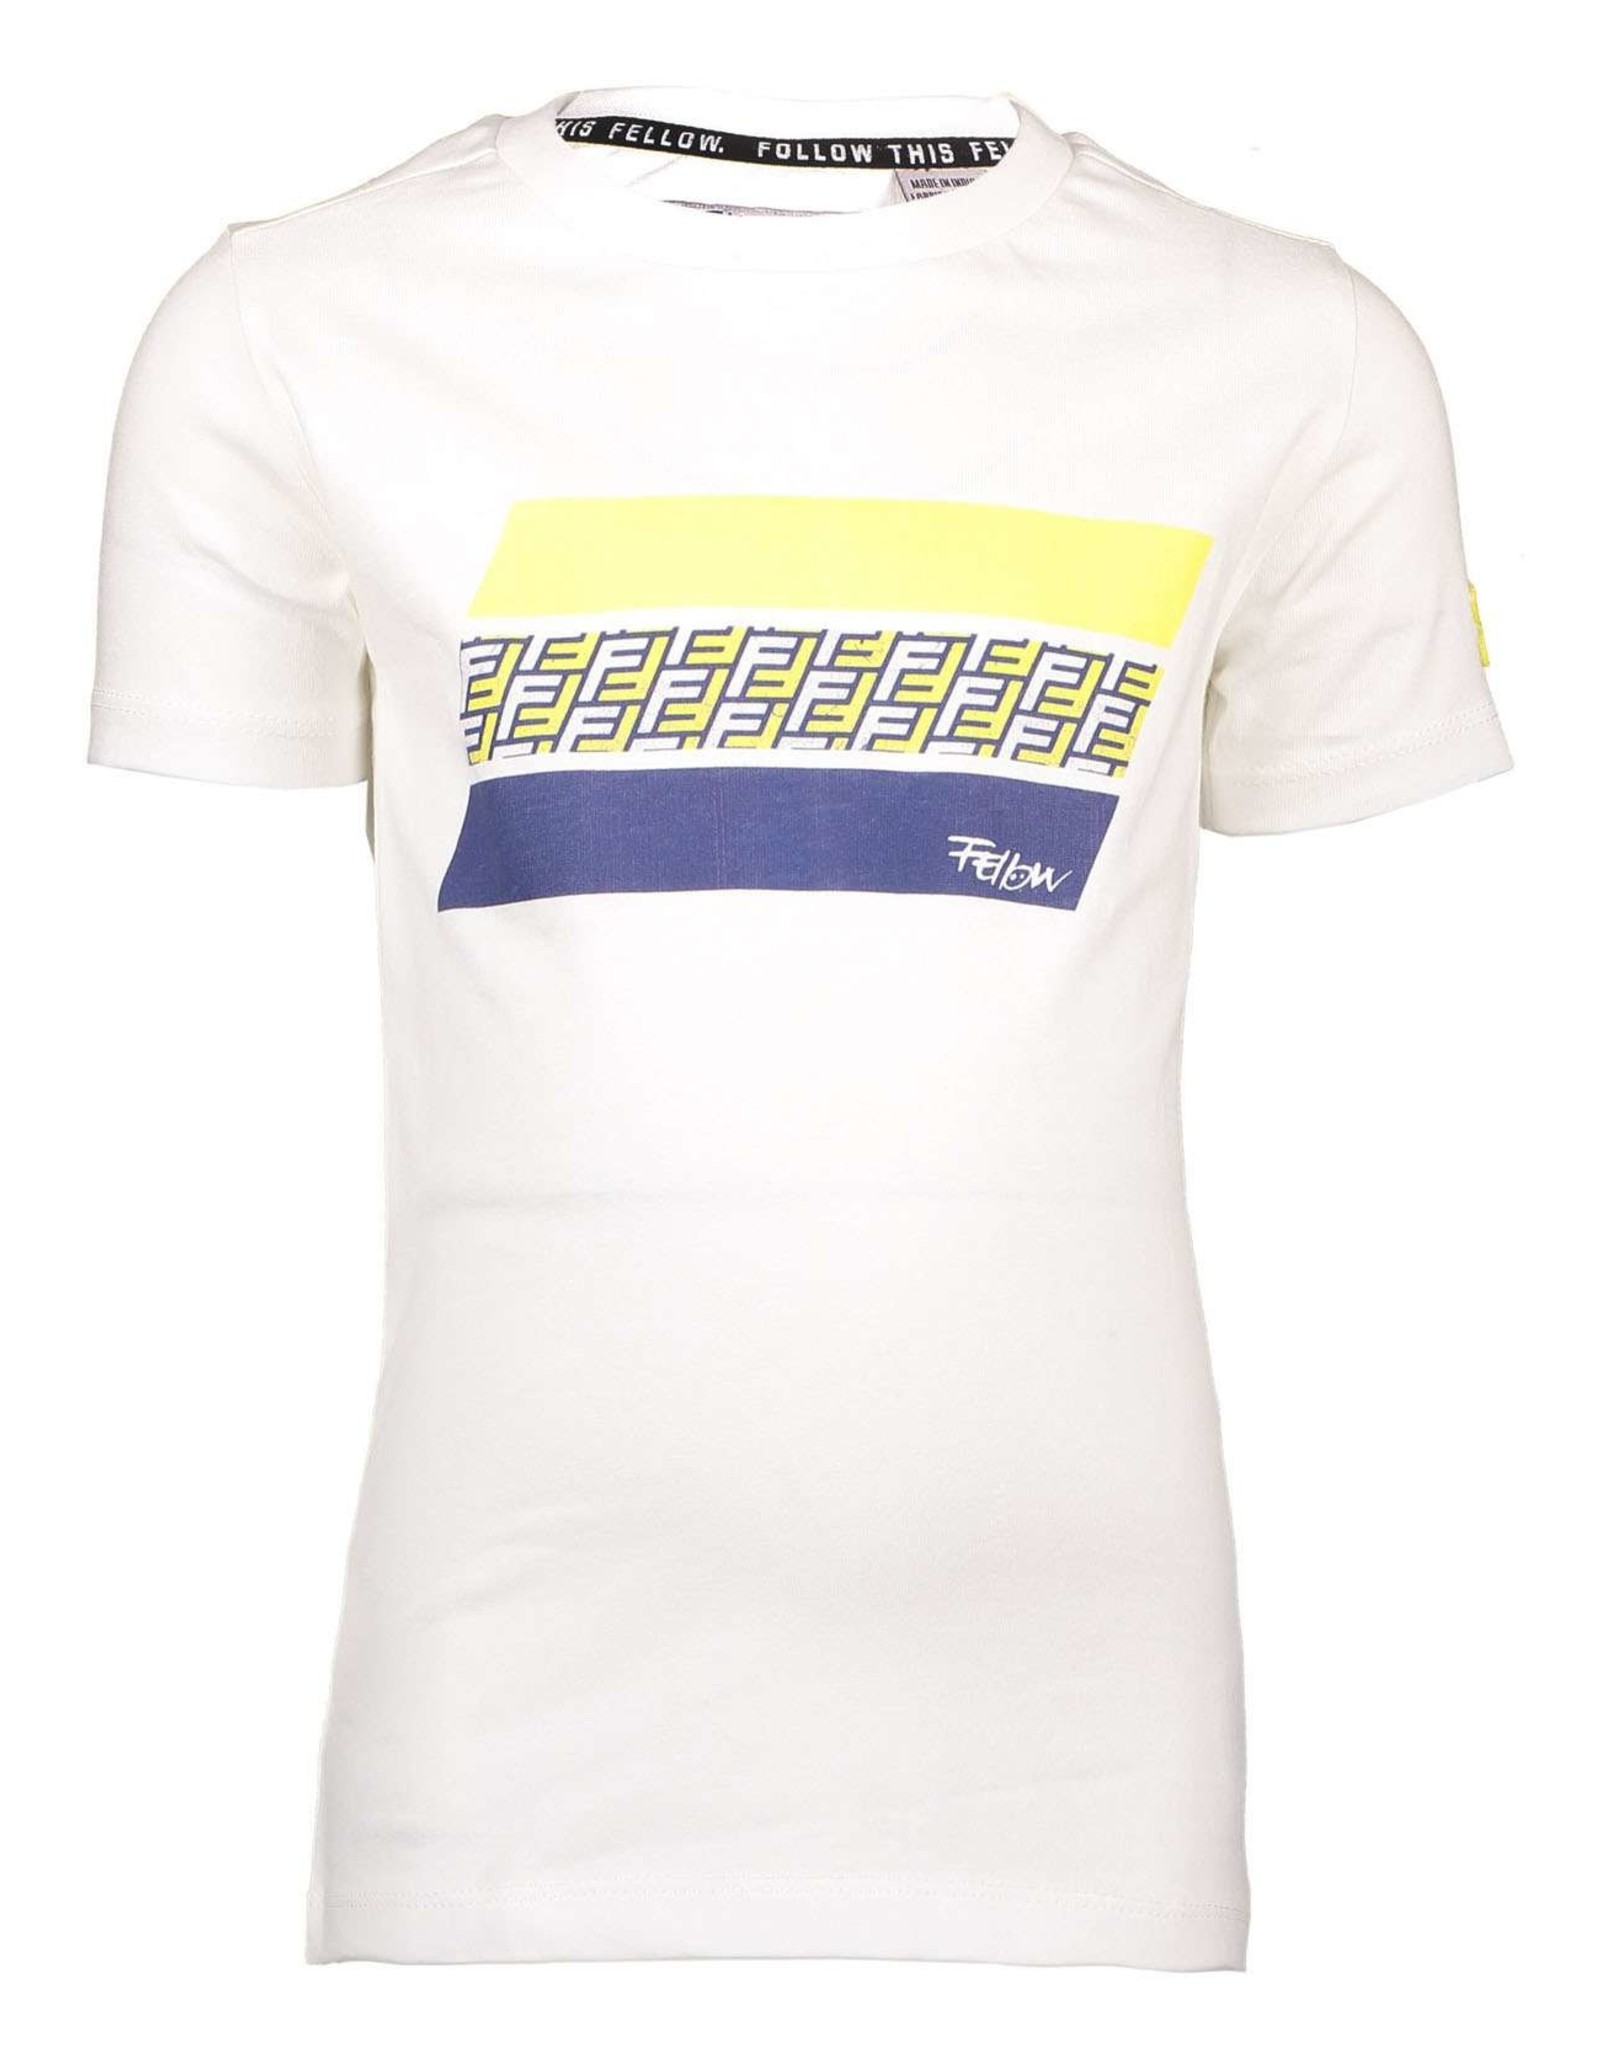 Moodstreet Fellow Moodstreet Fellow T-shirt White (OUTLET)